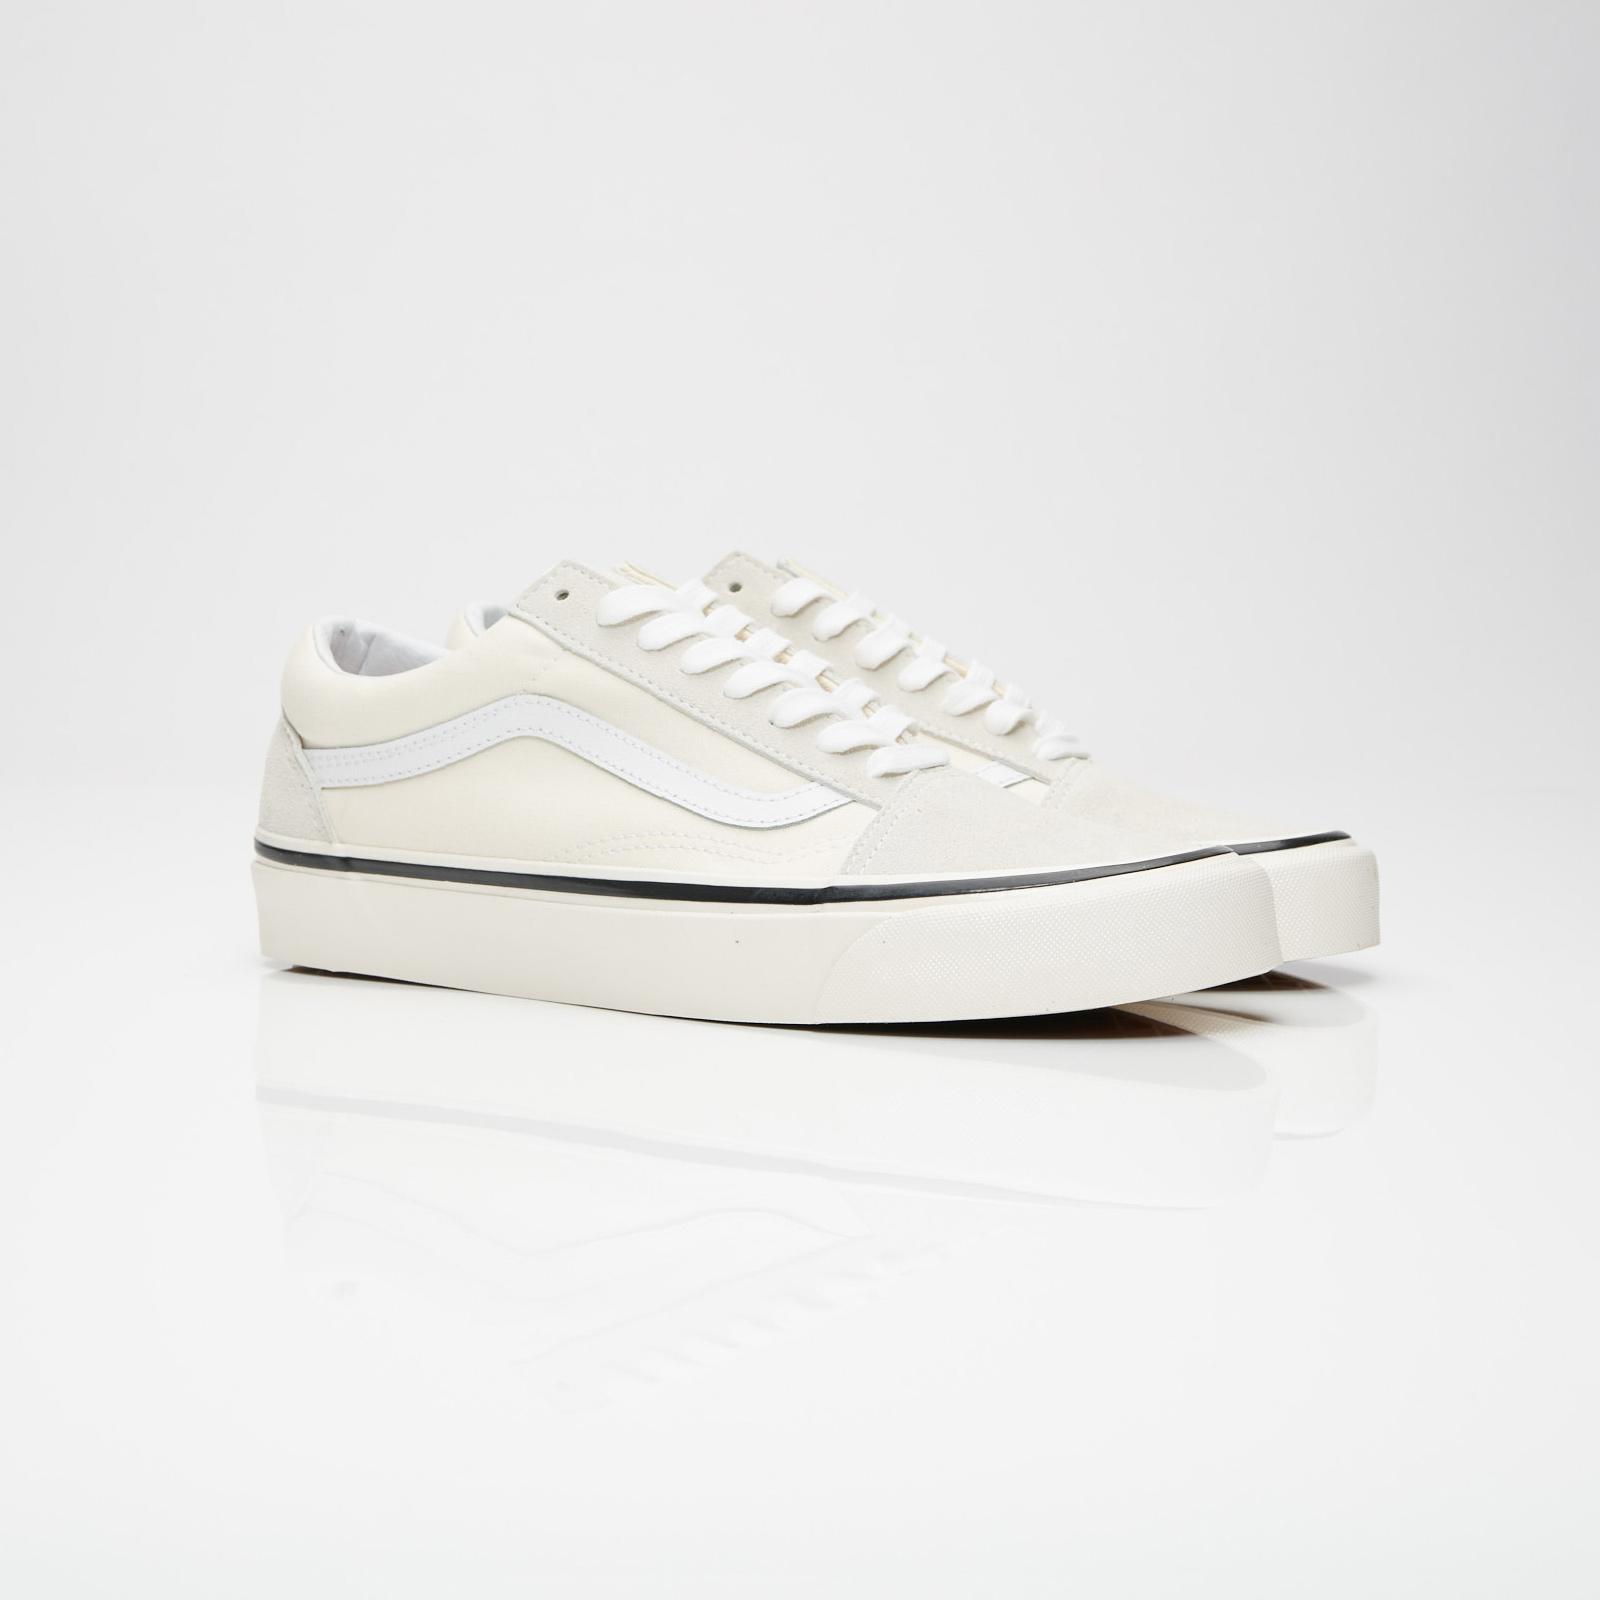 105ca7cec2ff Vans UA Old Skool 36 DX - Va38g2mr4 - Sneakersnstuff